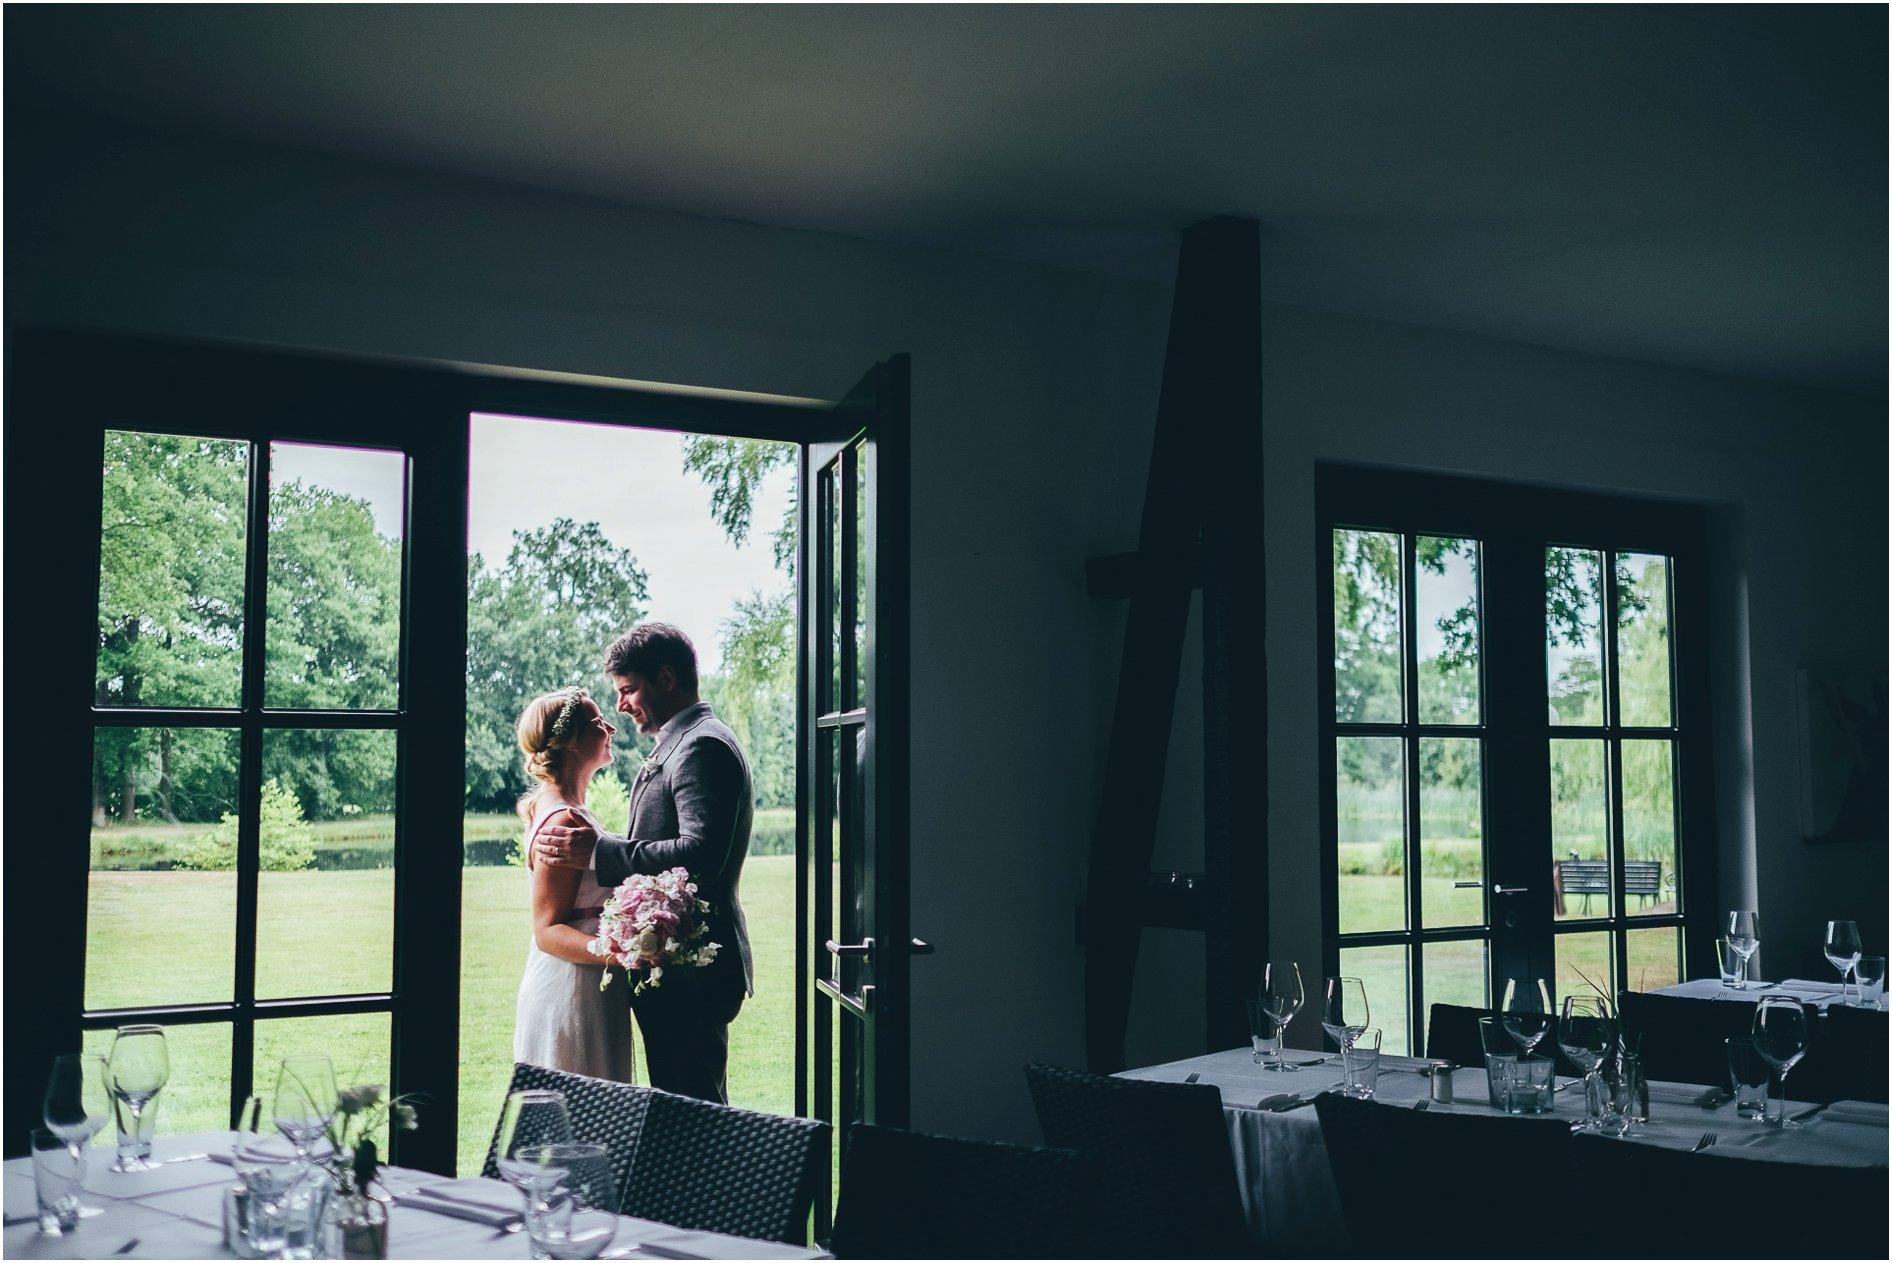 2016-04-19_0074 Sandra & Janis - Hochzeitsfotograf in Seevetal